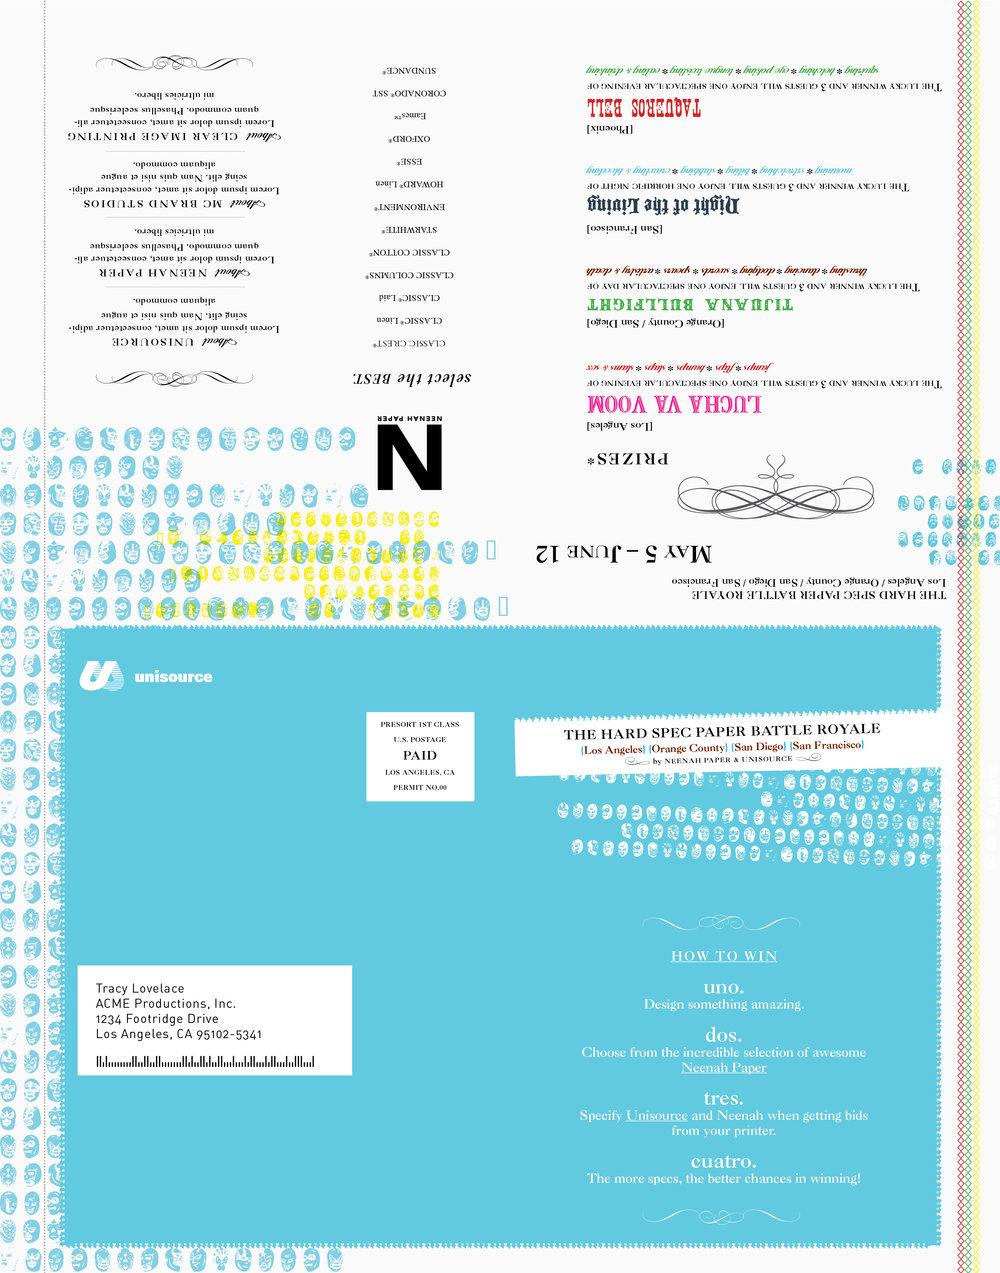 unisource neenah paper promo2.jpg